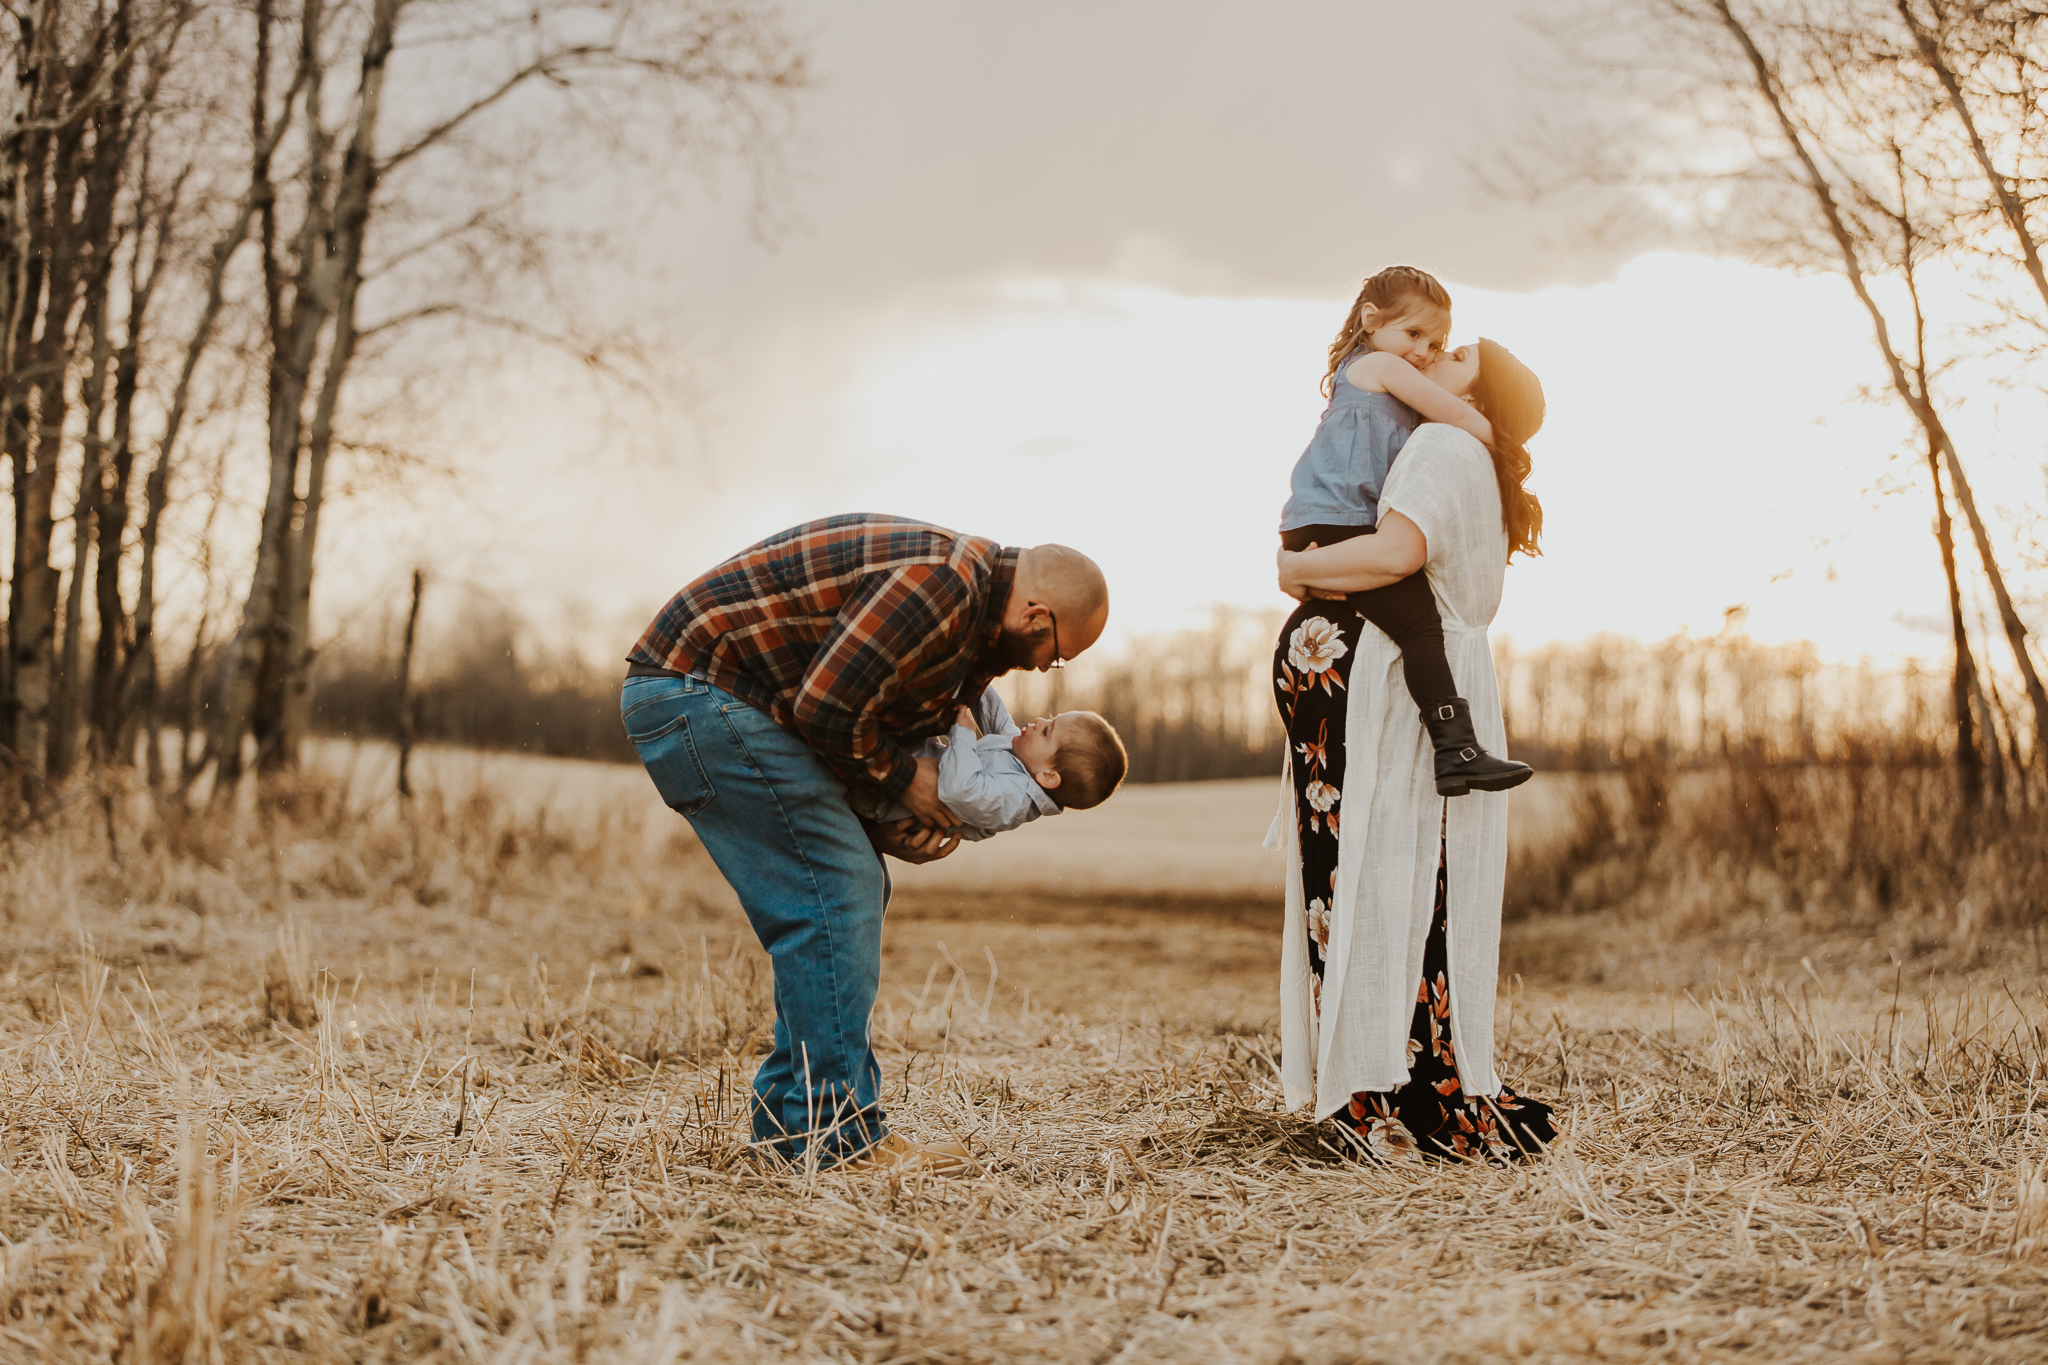 Alina-Joy-Photography-Cold-Lake-Maternity-Photographer-Josee-32.jpg